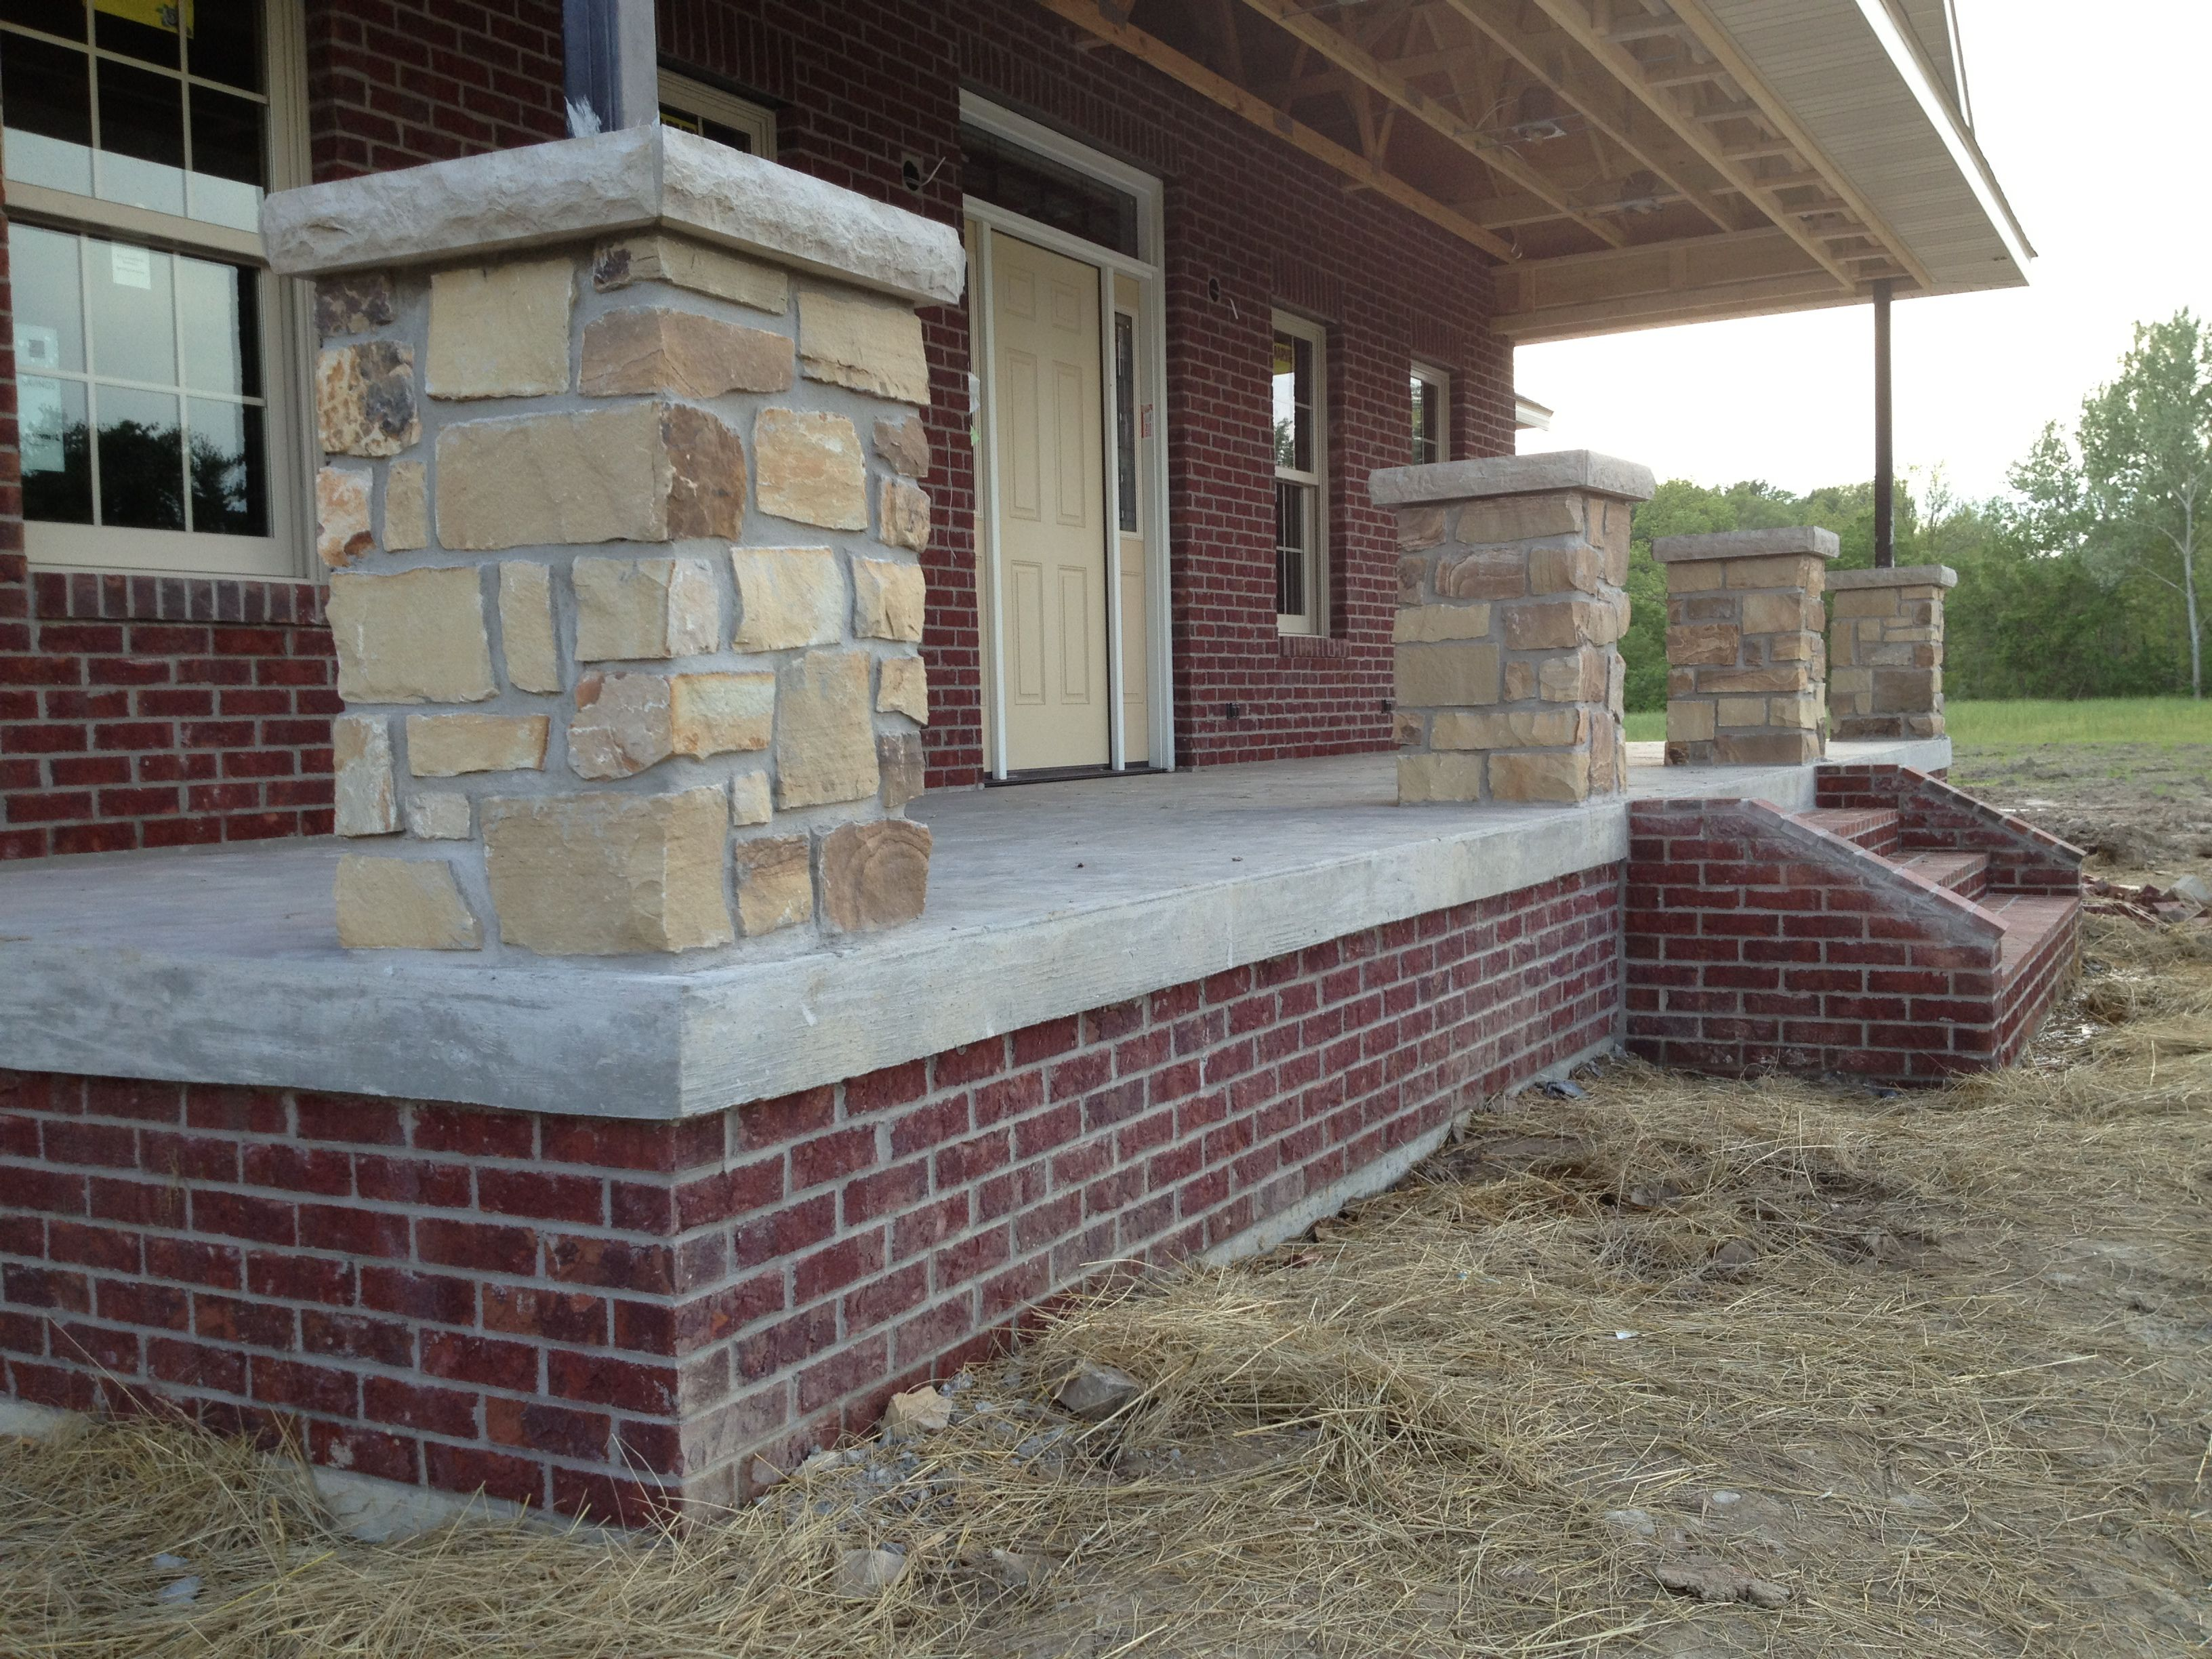 Brick And Stone Columns : Stone porch column with dark red brick my dream home